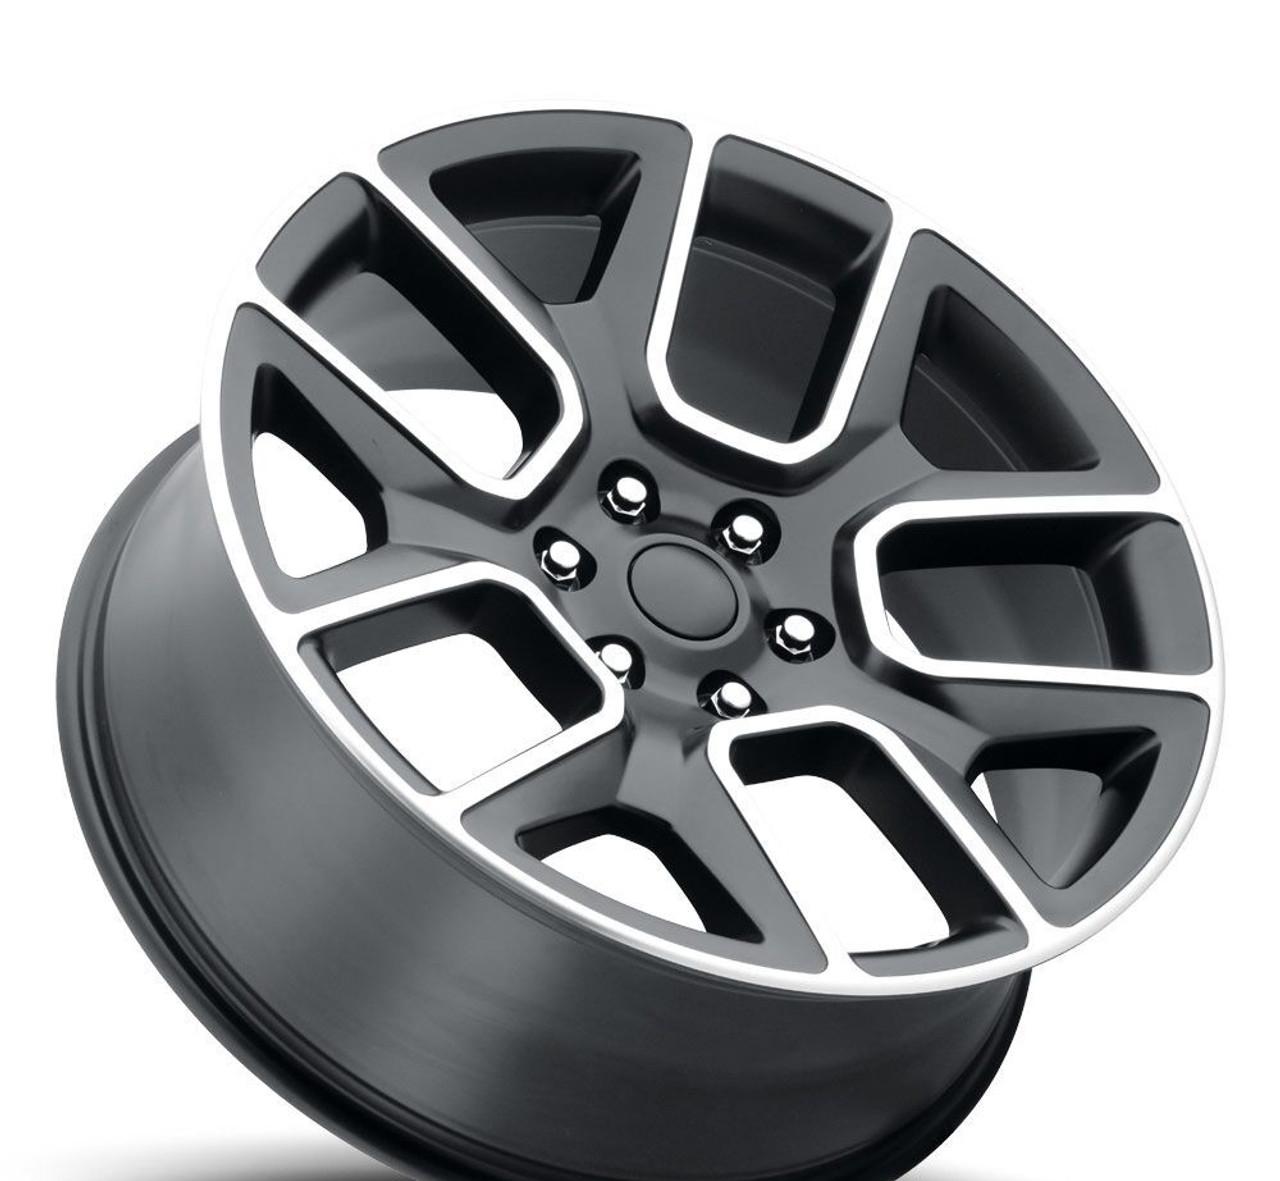 Dodge Ram Rims >> 22 Fit S 2019 Dodge Ram 1500 Laramie Hemi Wheels Satin Black Machined Face Set Of 4 22x9 Rims